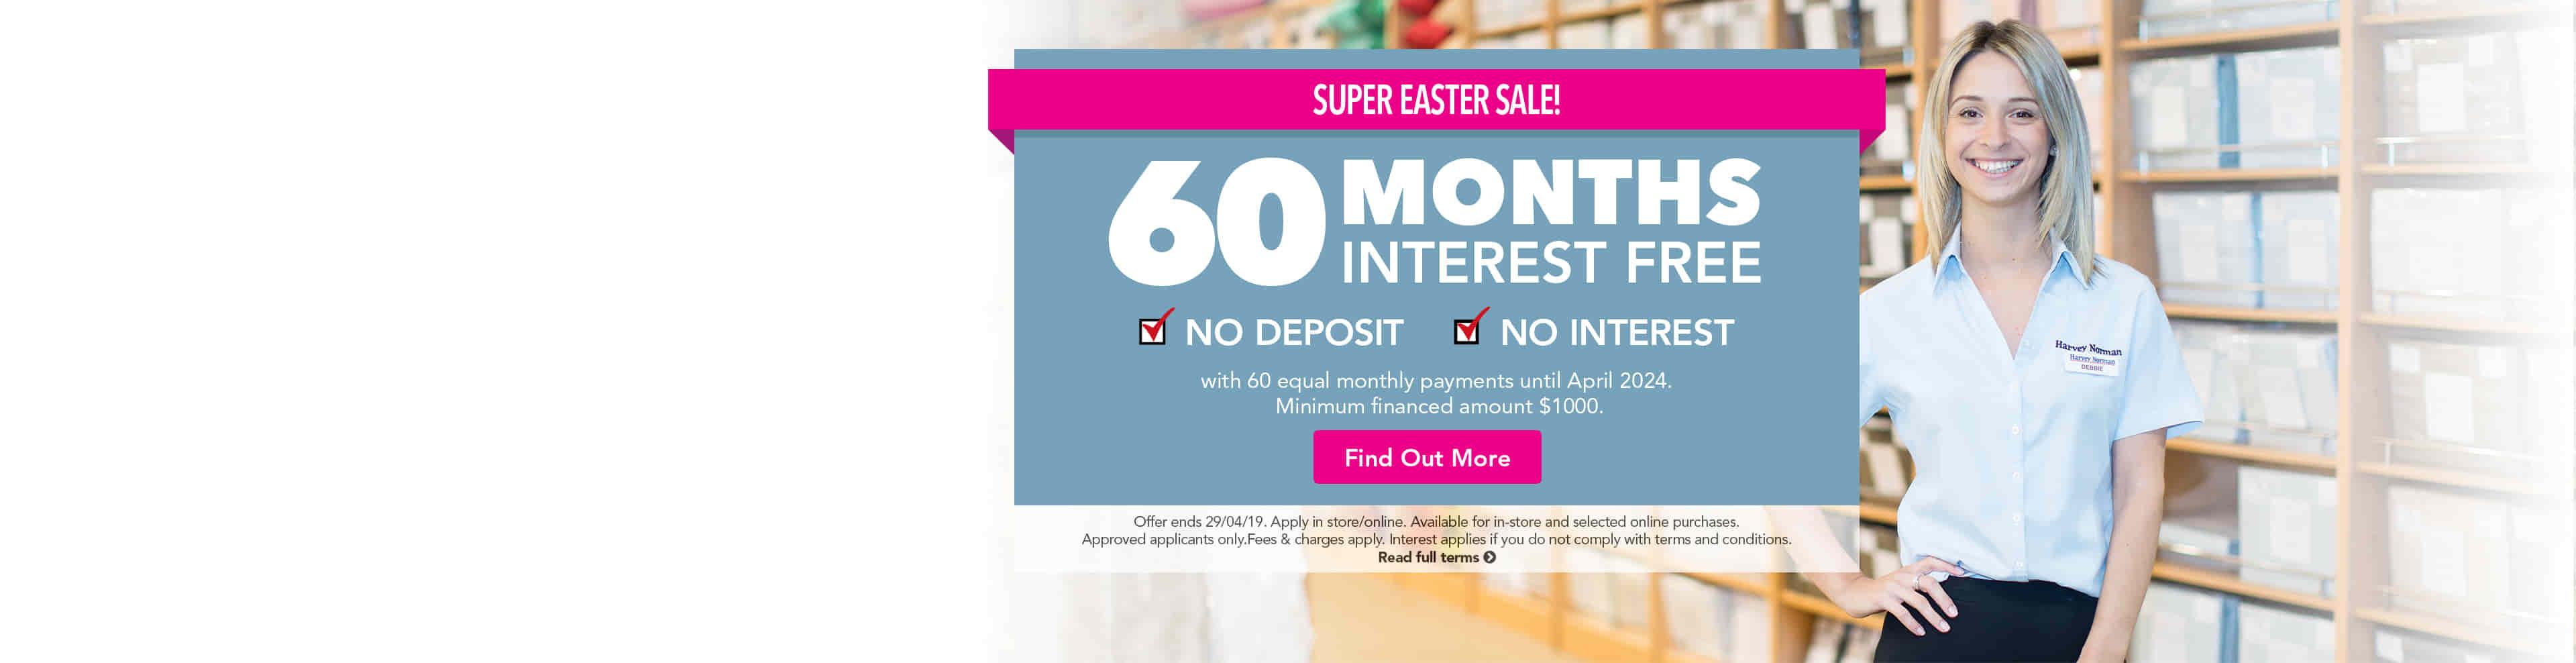 60 months interest free harvey norman